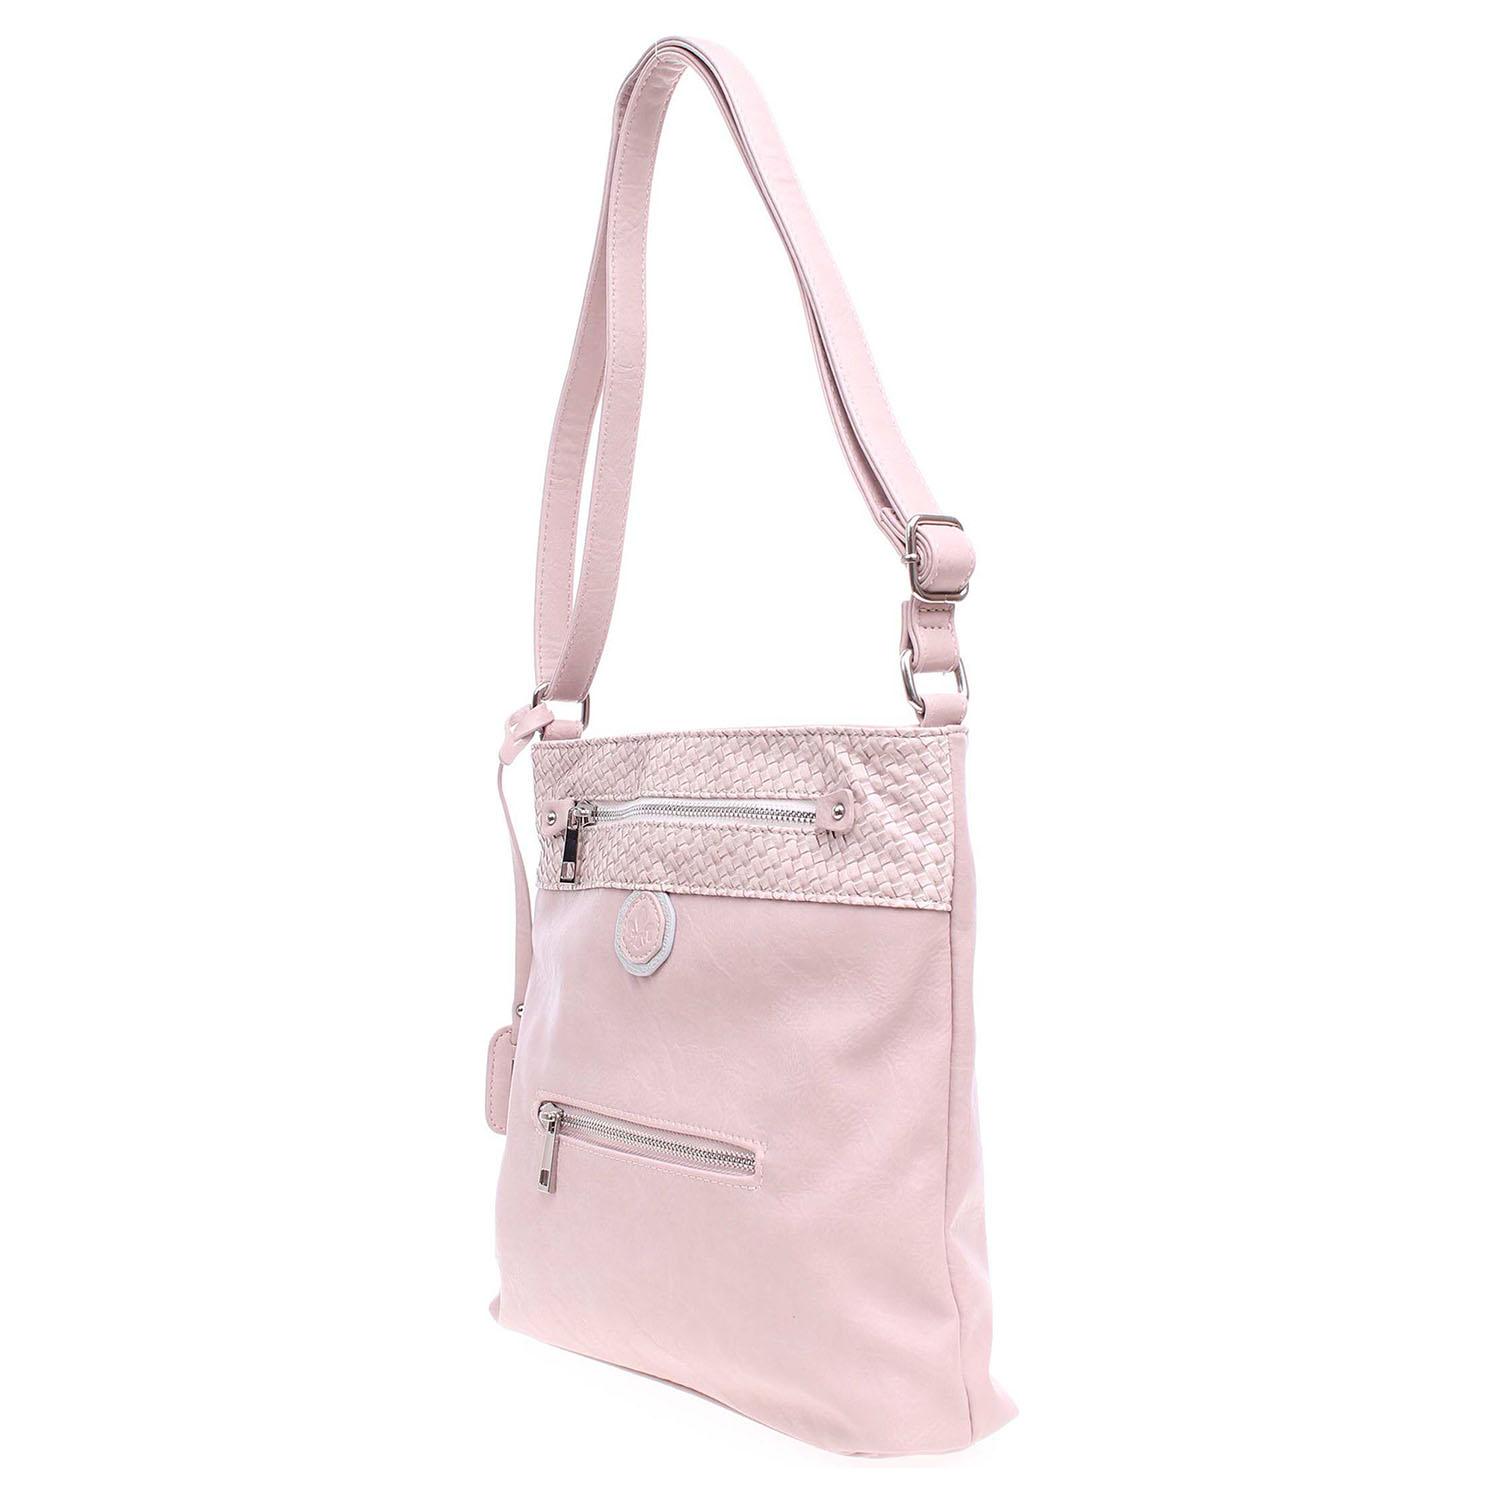 Ecco Rieker dámská kabelka H1302-31 rosa 11891136